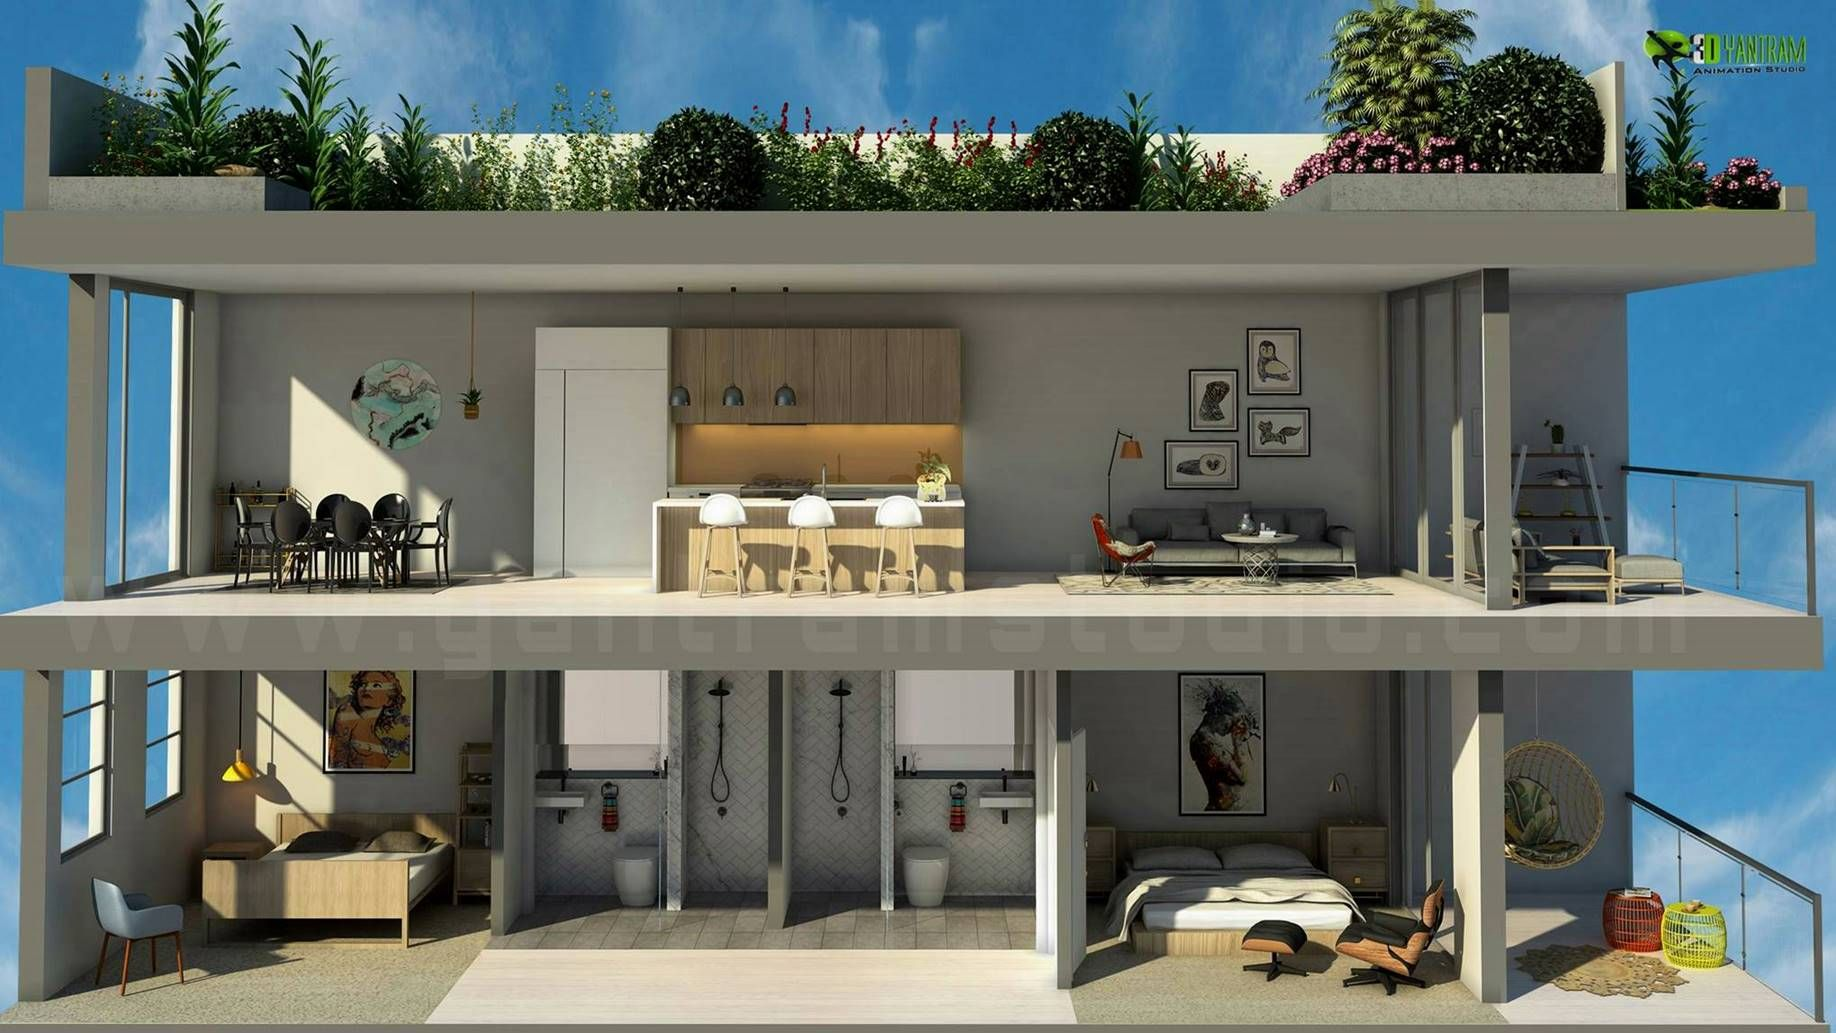 3d Section Floor Plan Cgi Design Animation Architectural Design Studio Floor Plan Design Site Plan Design